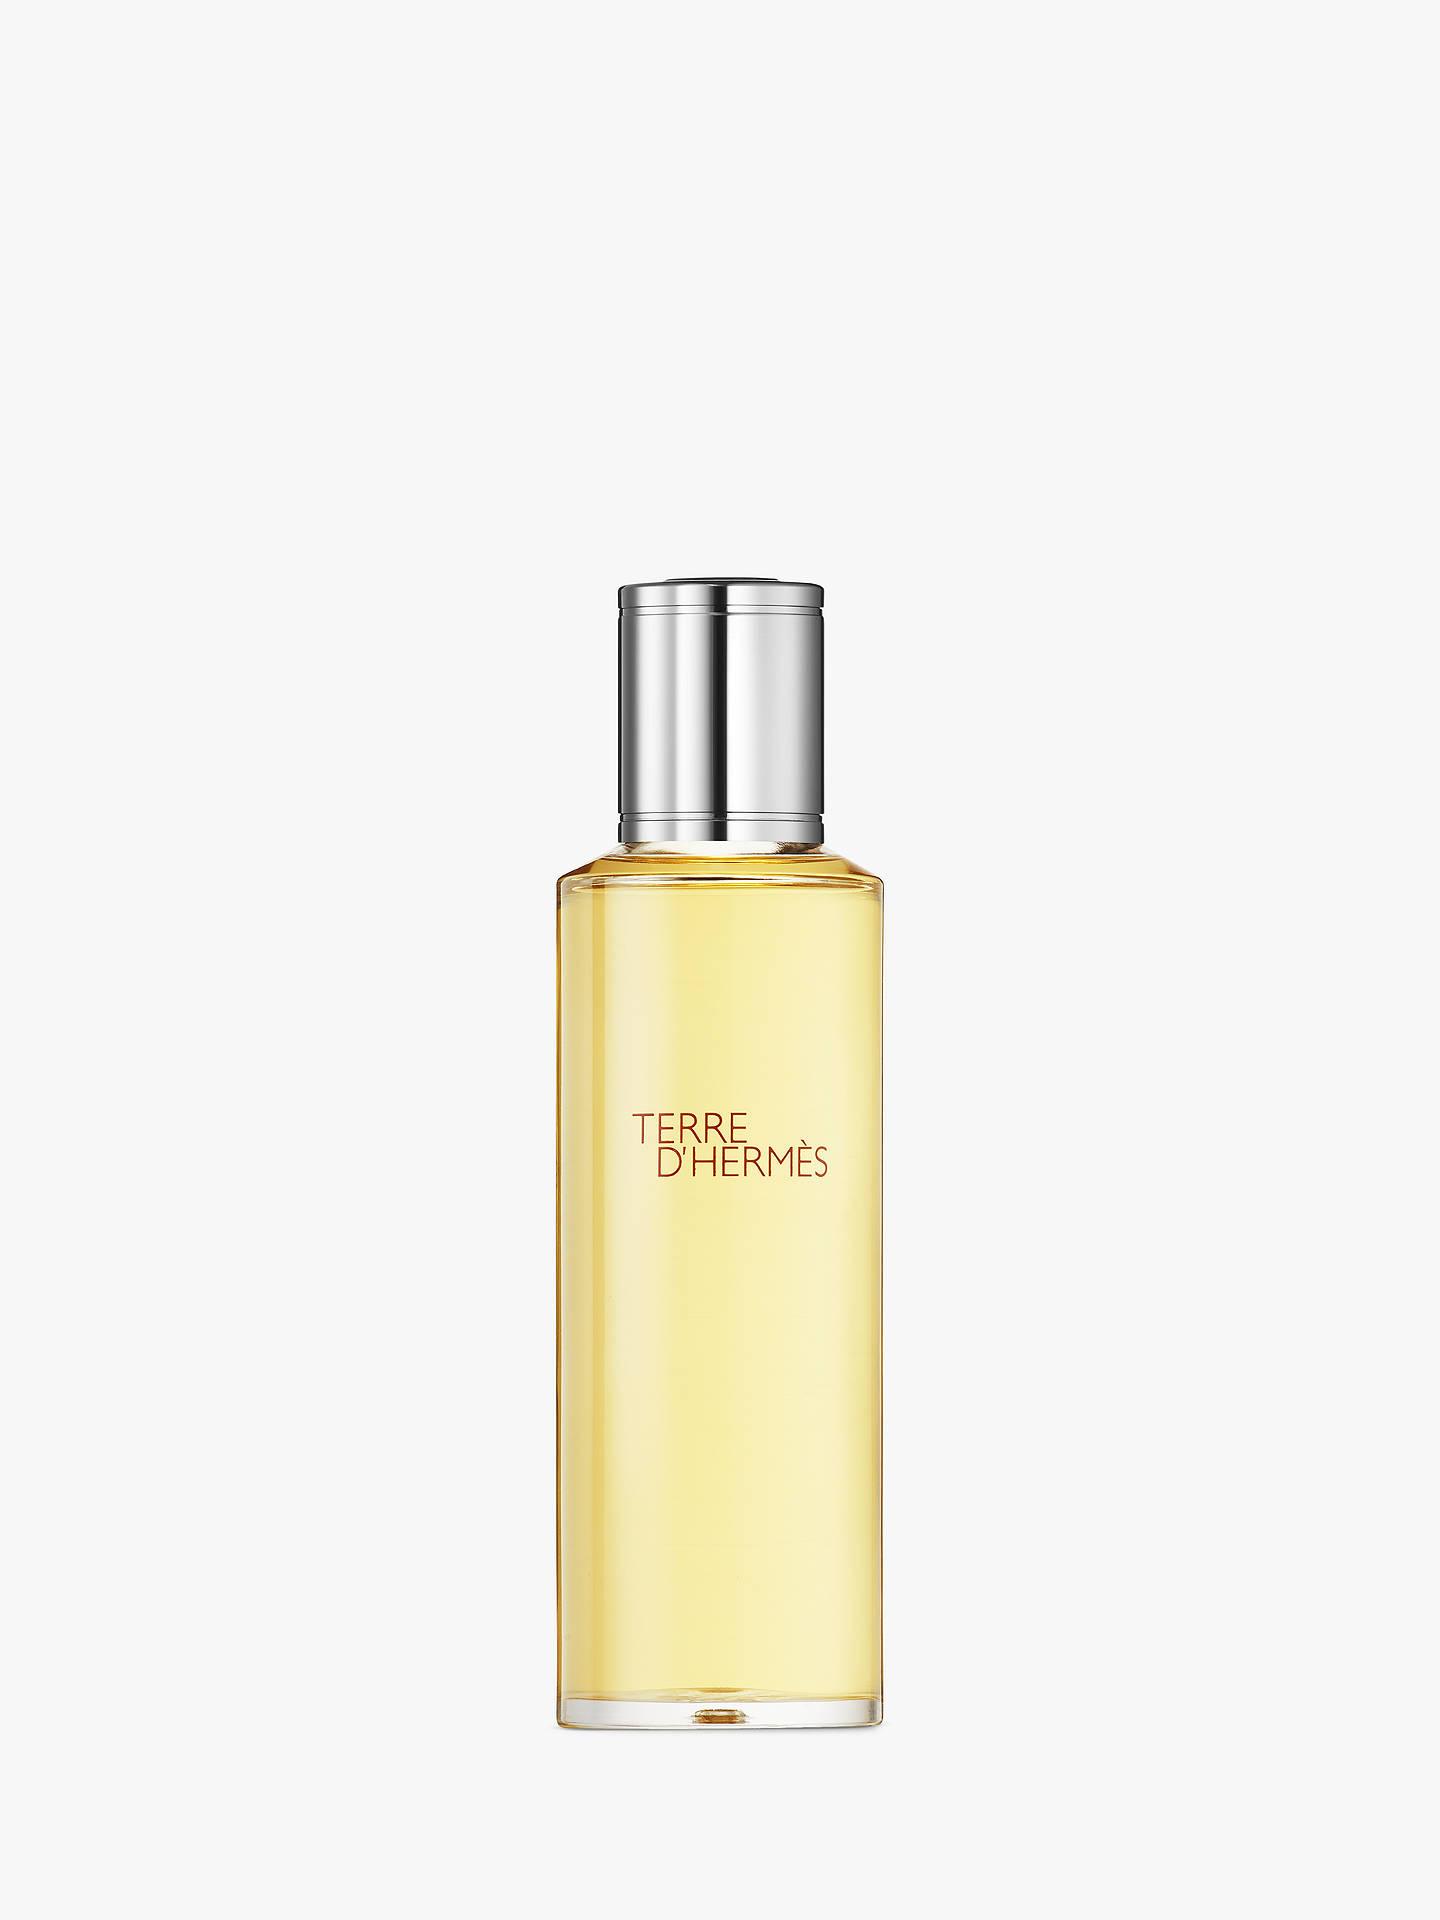 Hermès Terre Dhermès Parfum Recharge 125ml At John Lewis Partners